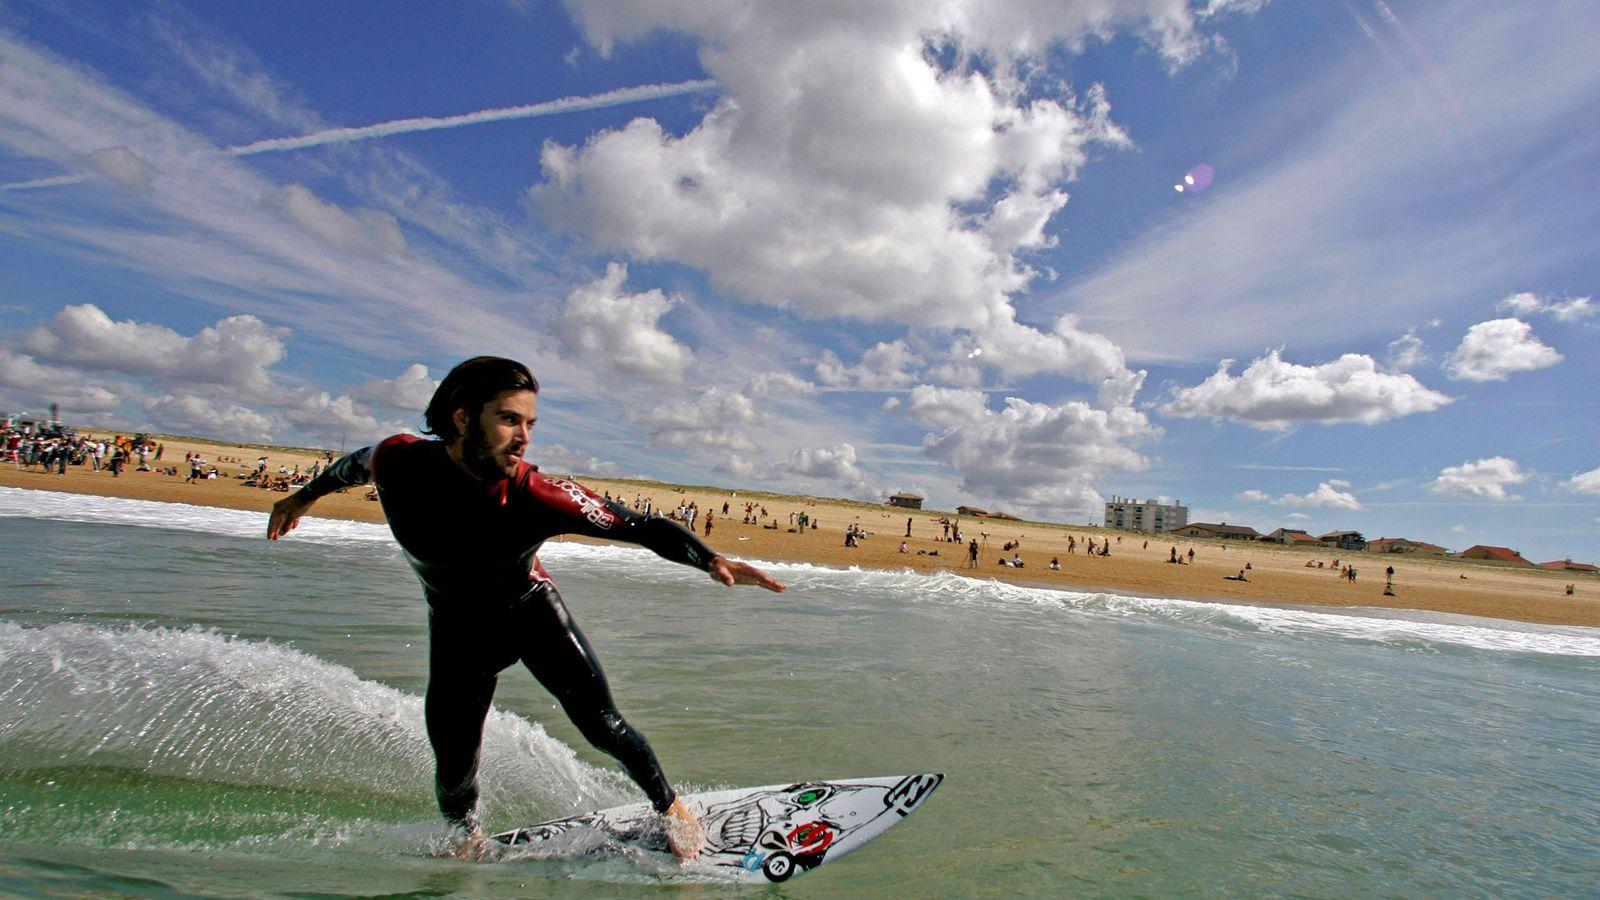 Surfing Hossegor, France